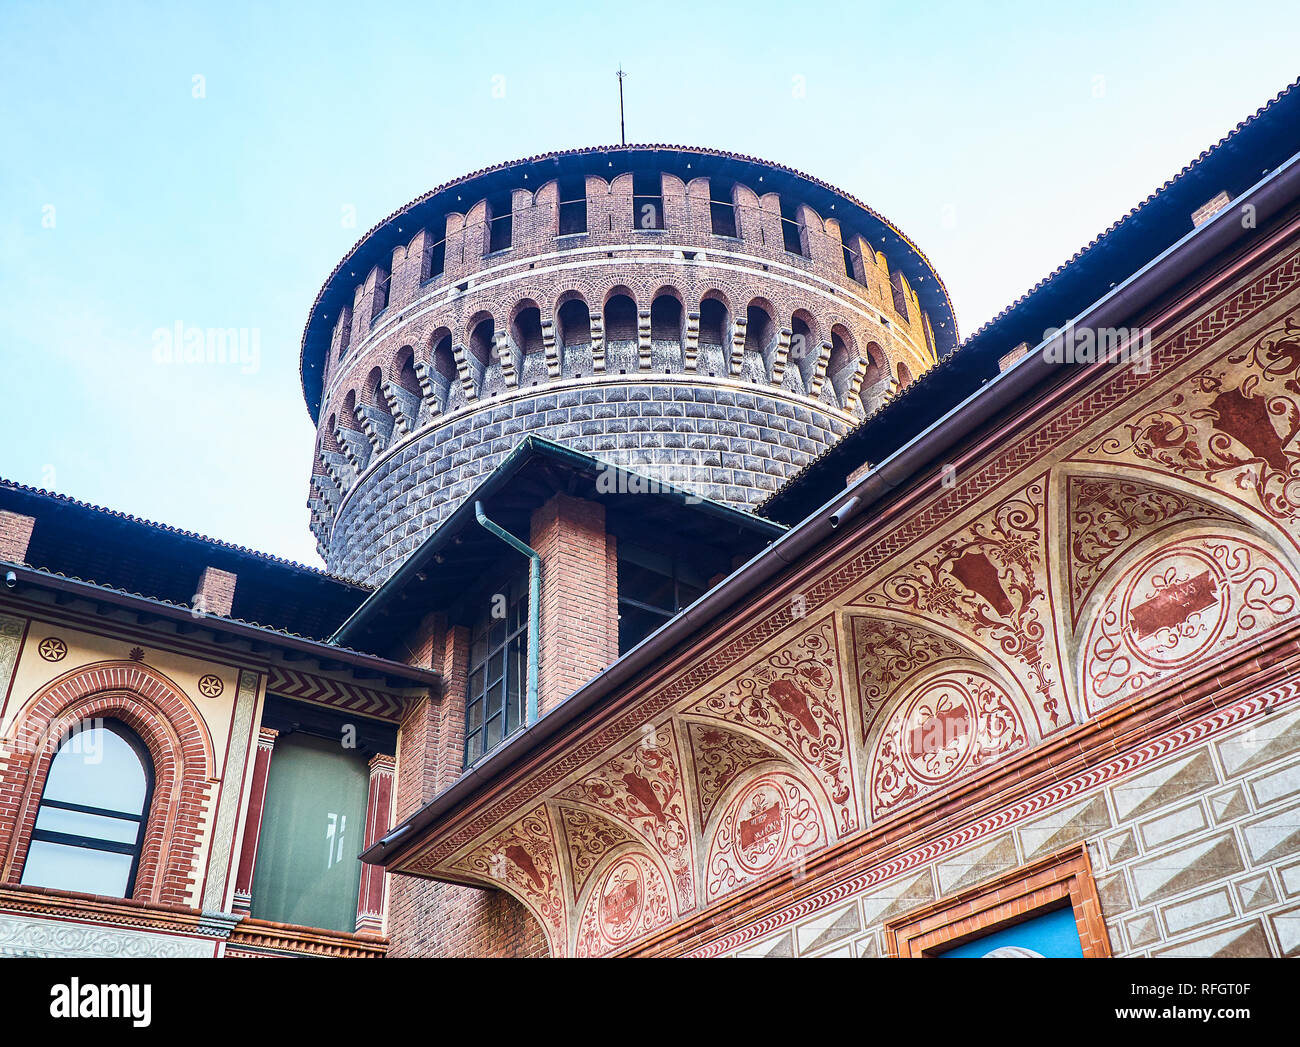 Torrione di Santo Spirito, Tower of the Holy Spirit of the Castello Sforzesco, Sforza Castle. Milan, Lombardy, Italy. - Stock Image